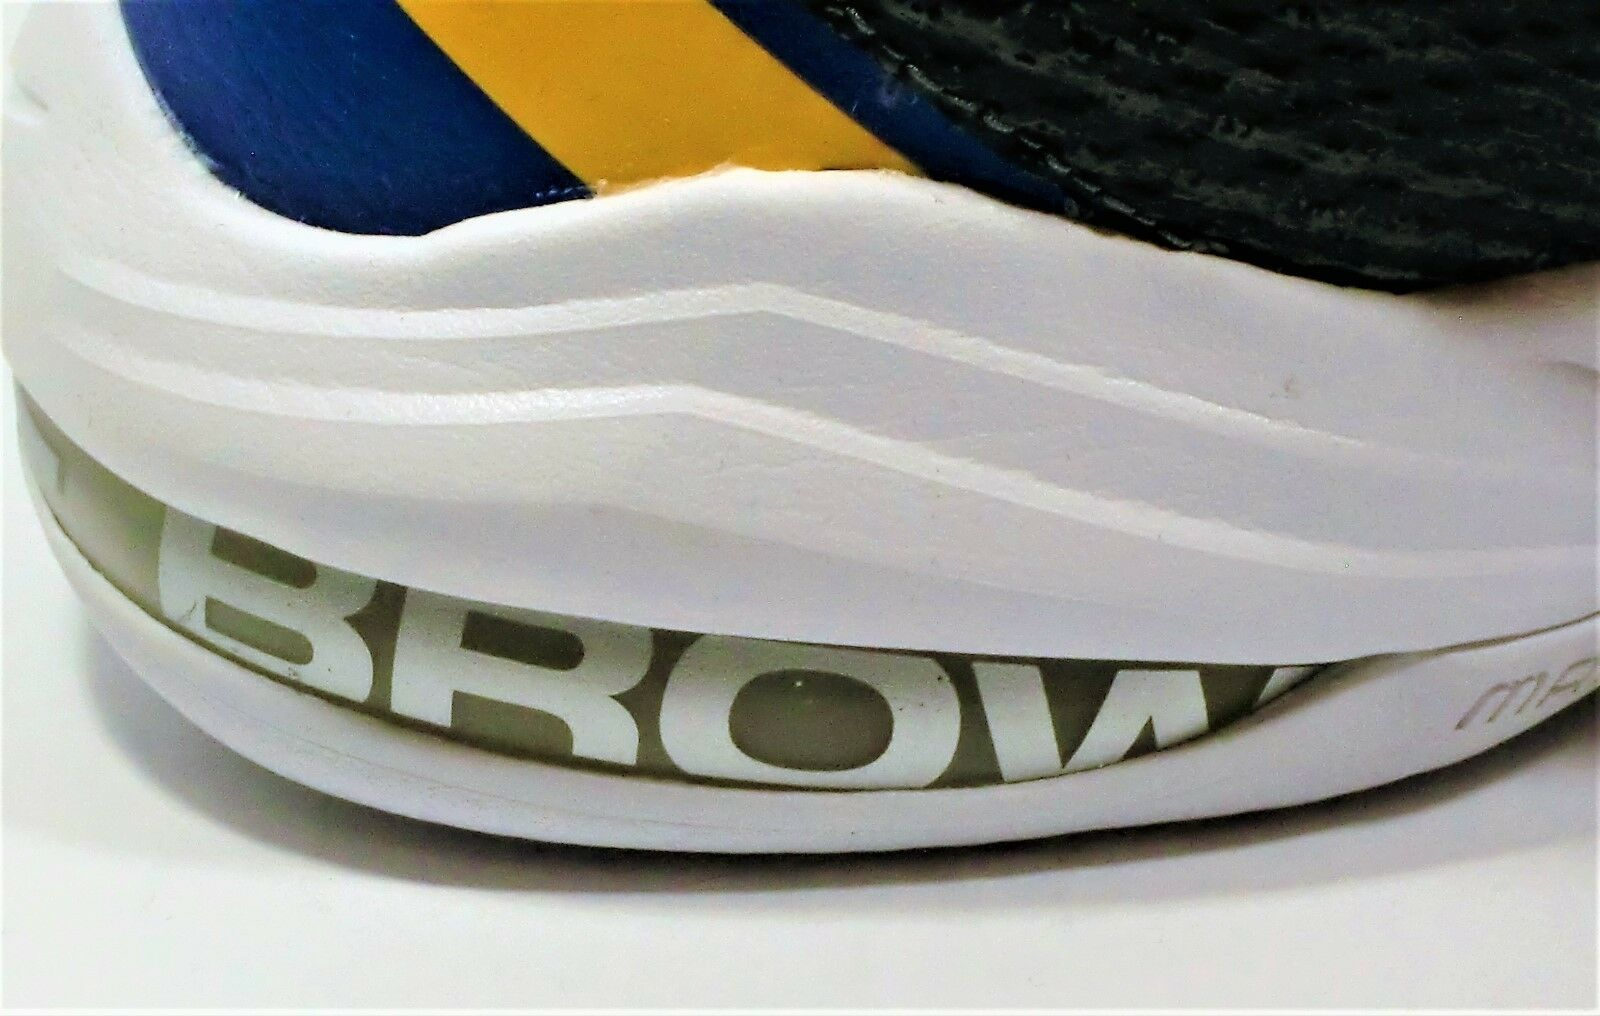 Nike Air Max Audacity ASG LMTD Anthony Davis Mens Shoes Sz 11 NEW 840677 100